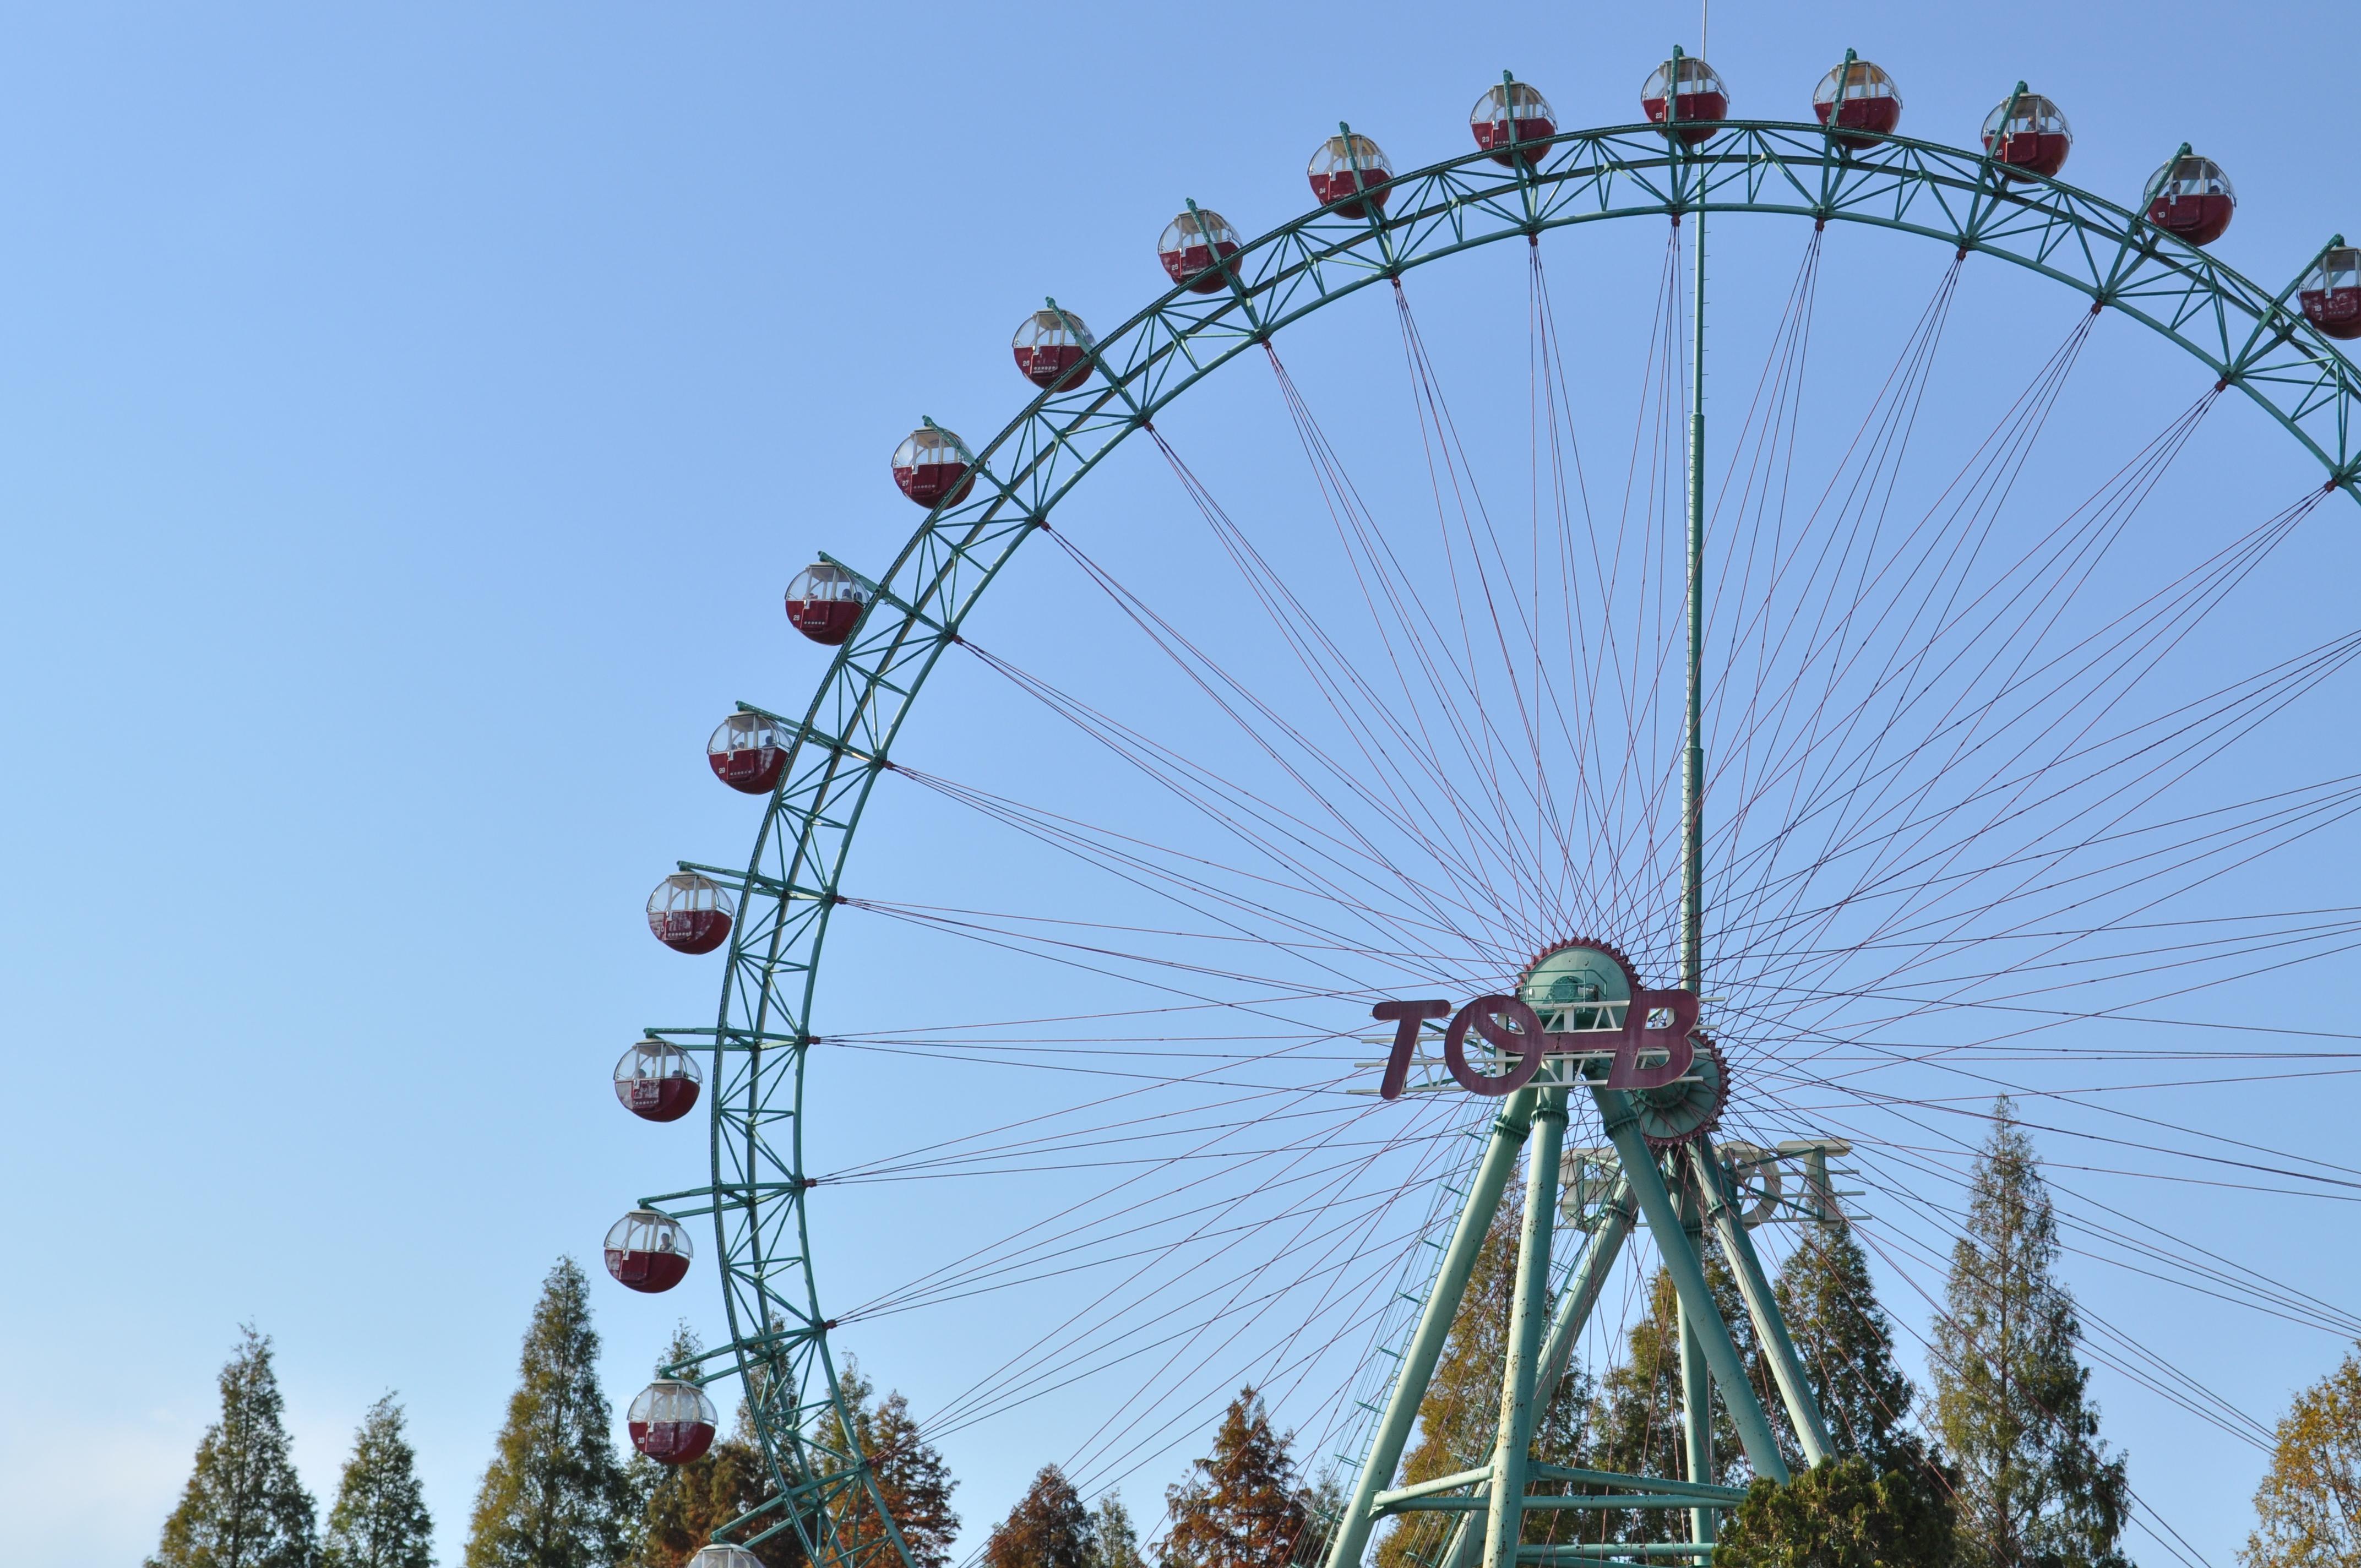 https://upload.wikimedia.org/wikipedia/commons/5/53/Ferris_wheel_in_Tobu_Zoo_Park_001.jpg